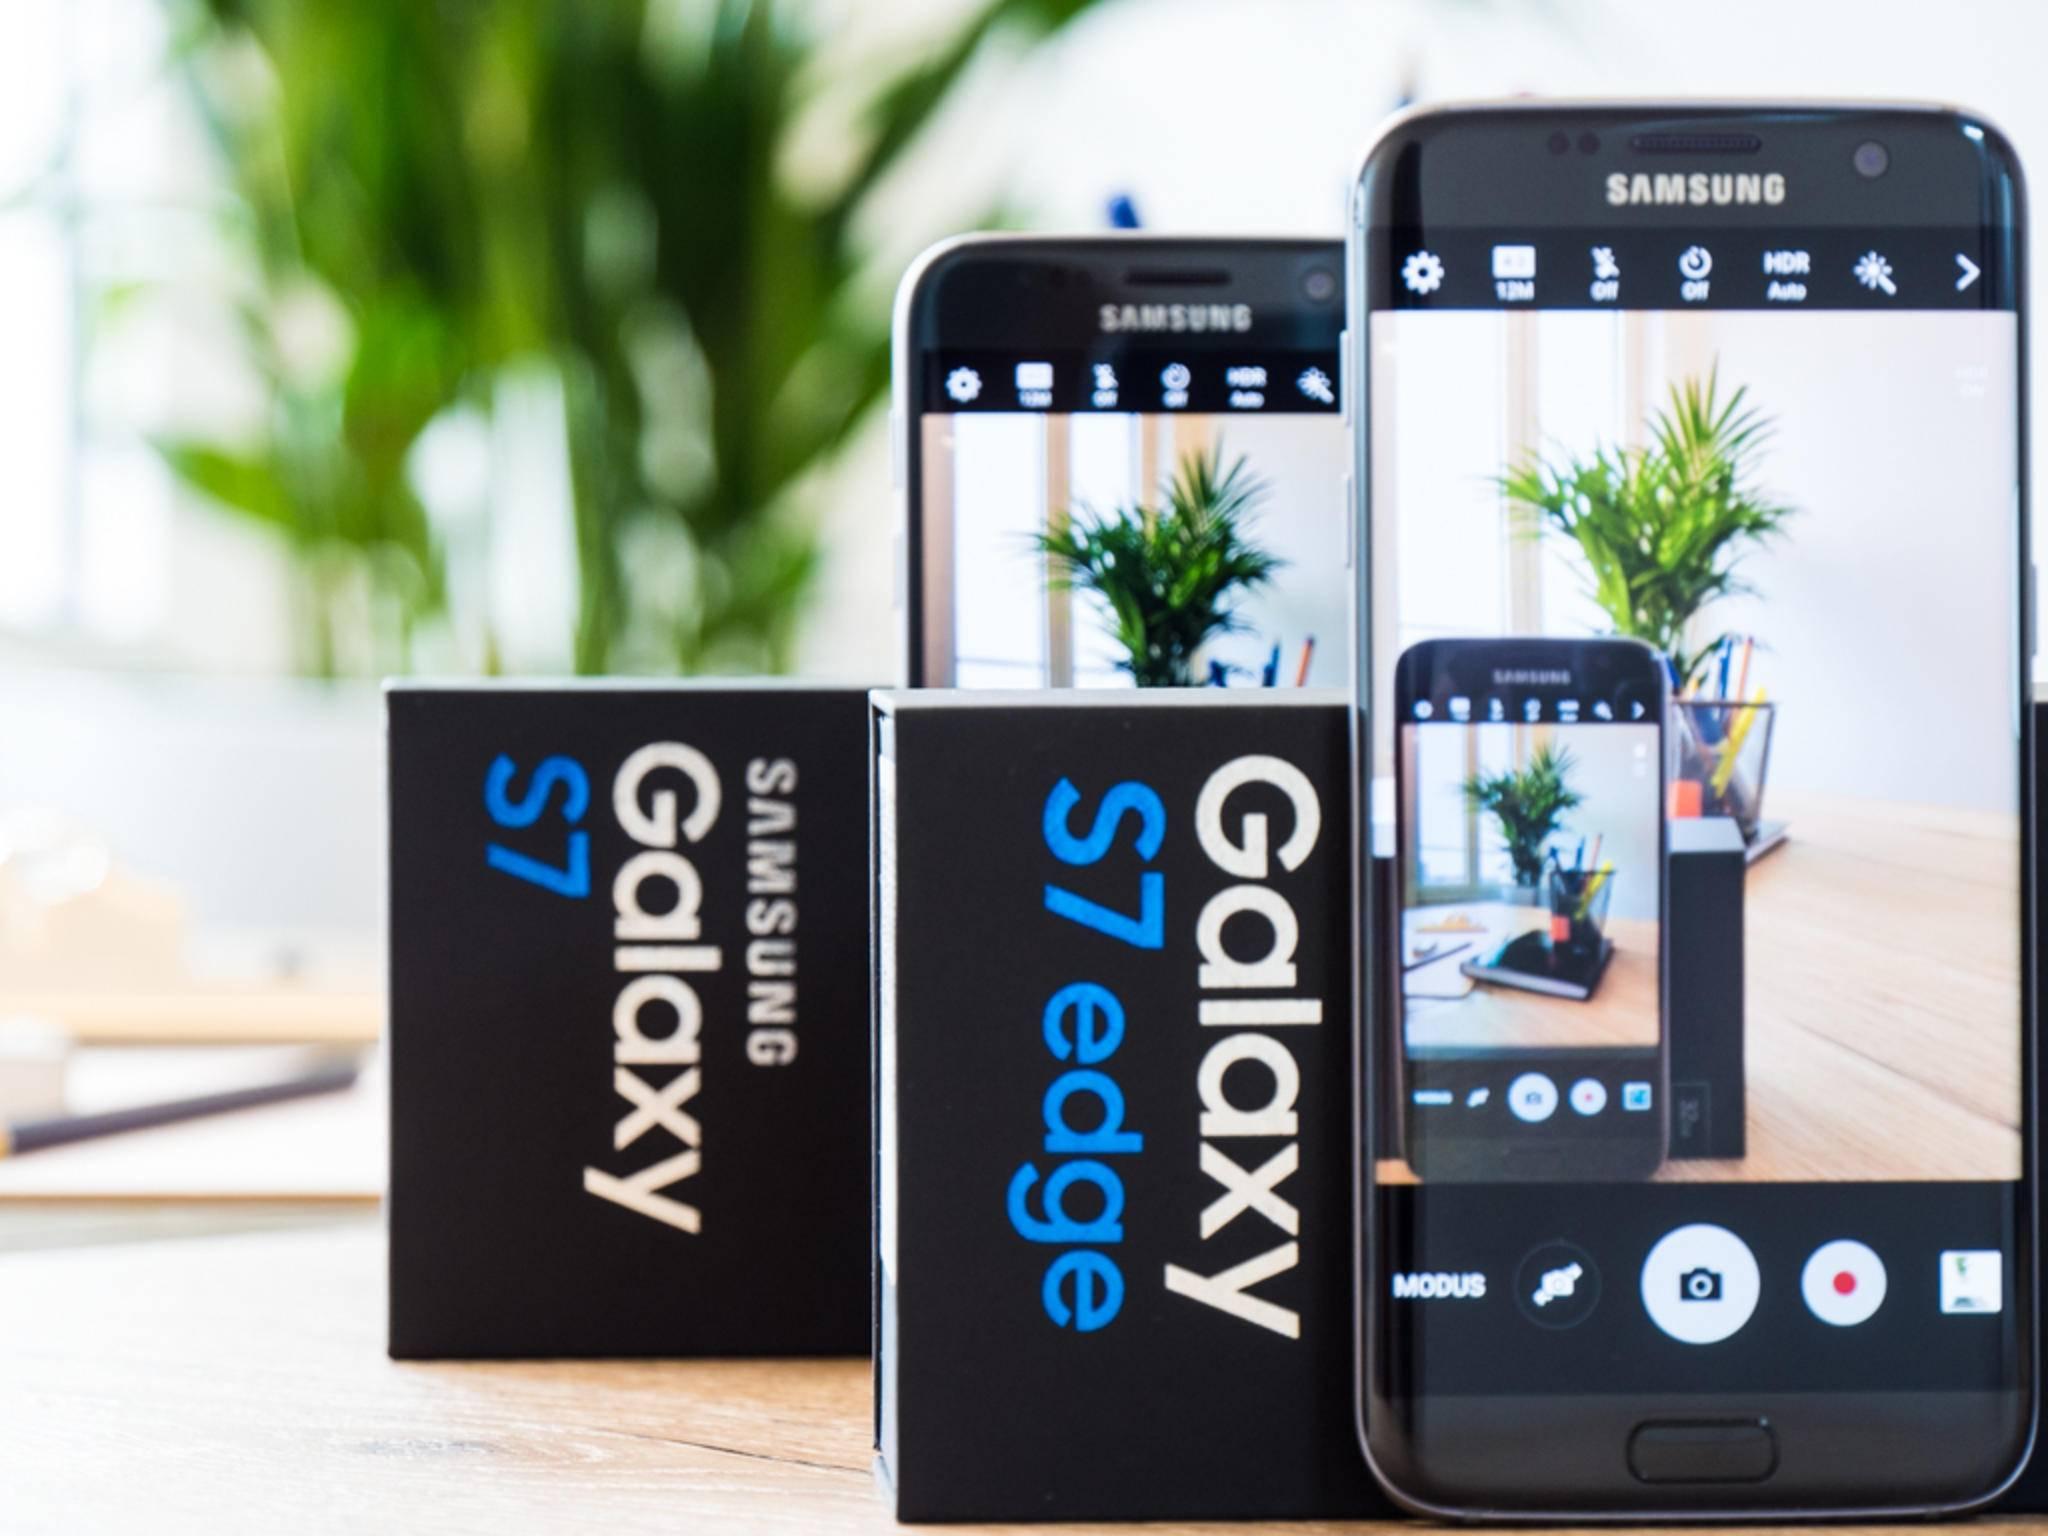 Galaxy S7 und S7 Edge bekommen wohl bald Android 7.